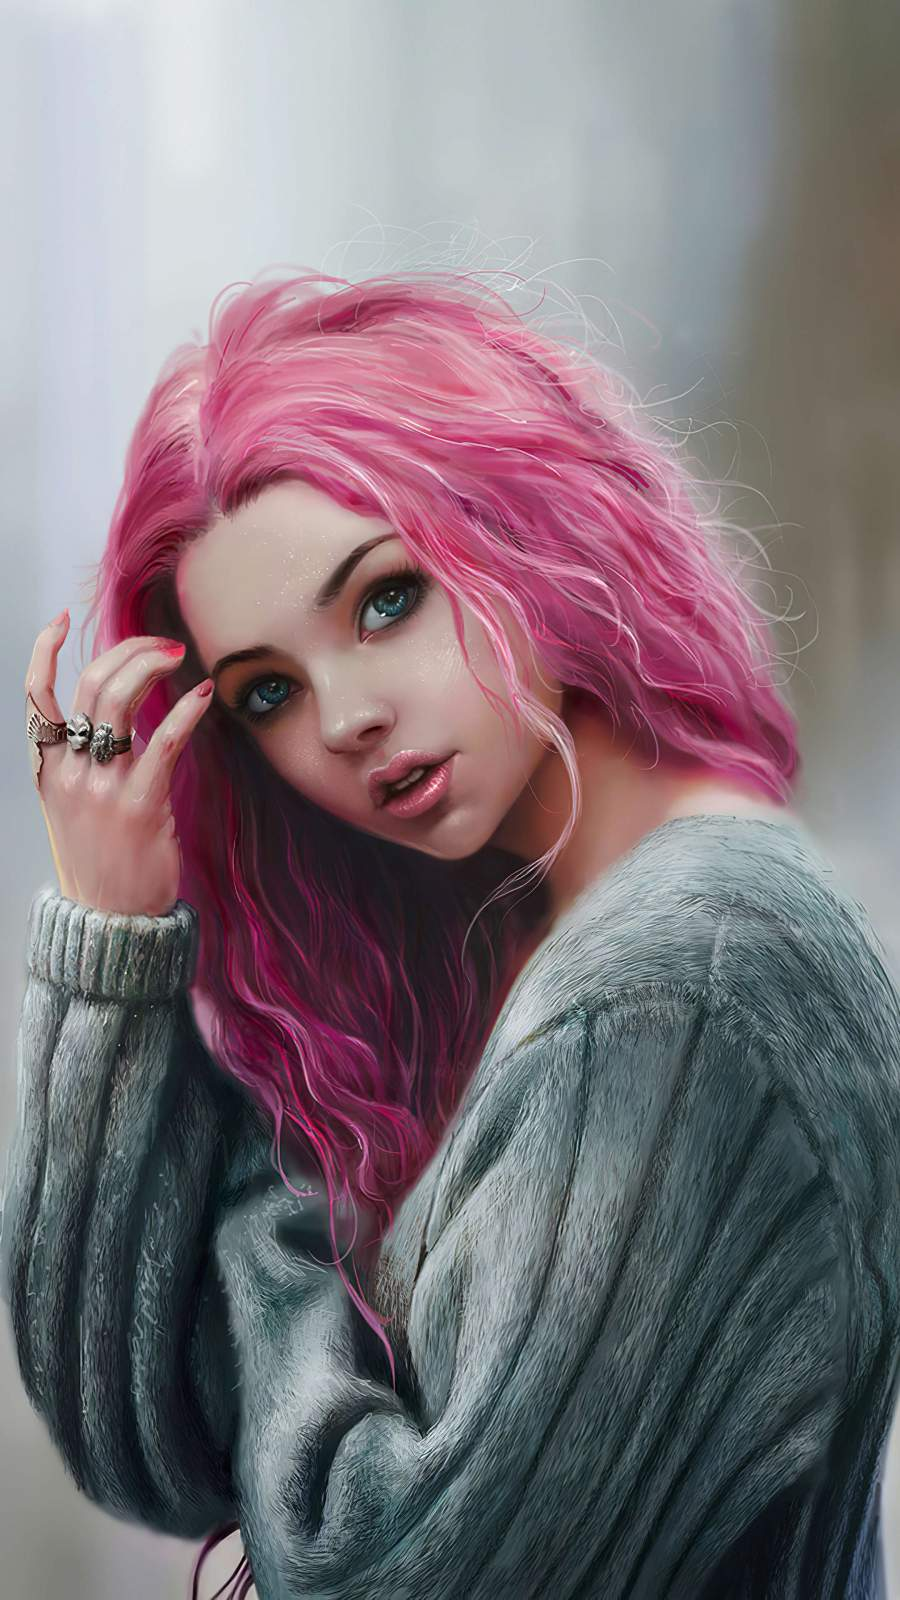 Pink Hair Girl iPhone Wallpaper